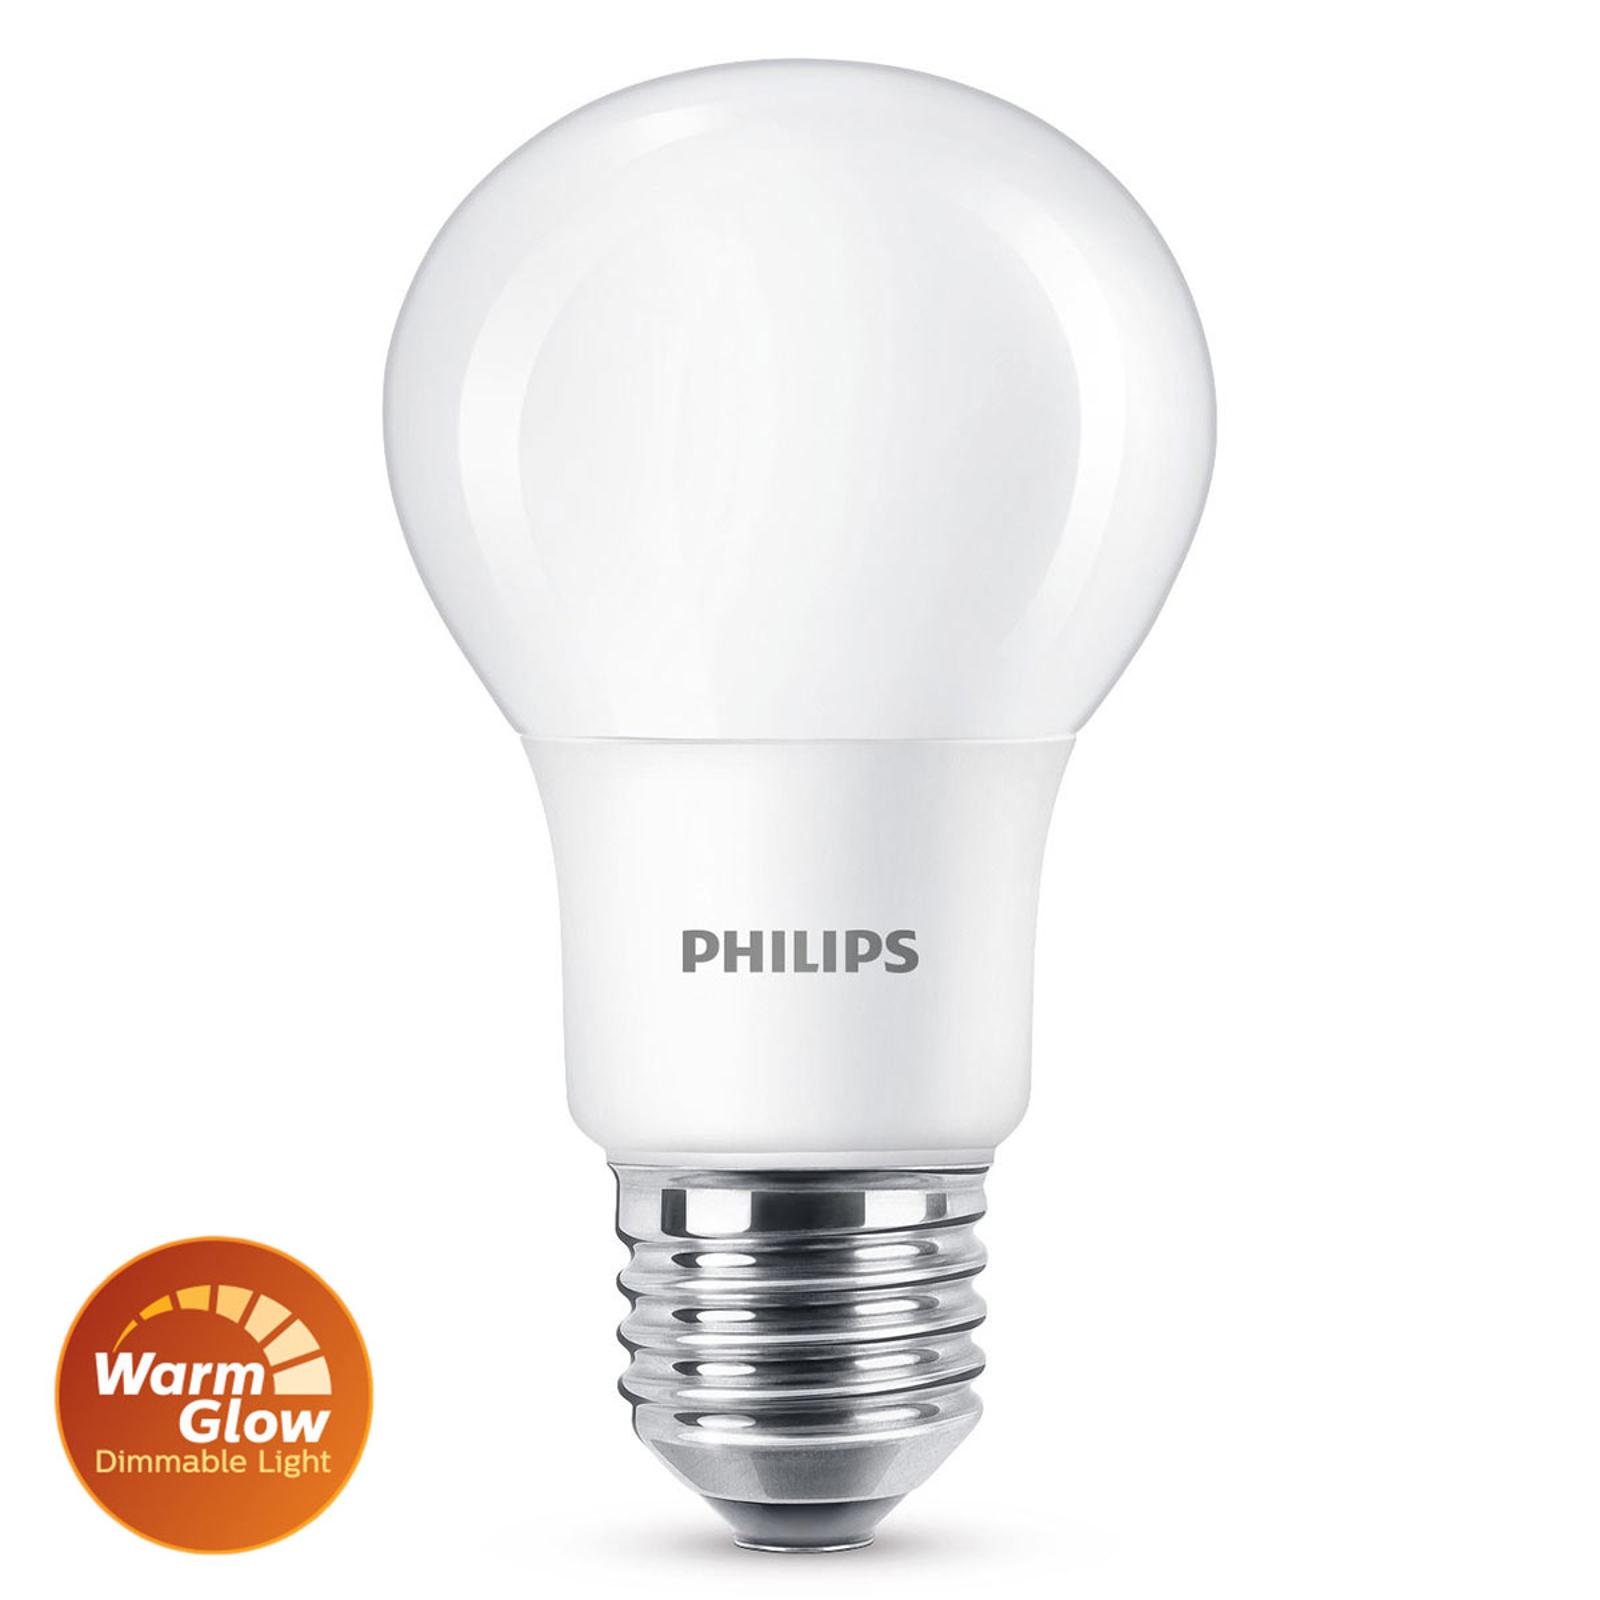 Philips E27 LED-pære WarmGlow 3,5 W matt, dimbar